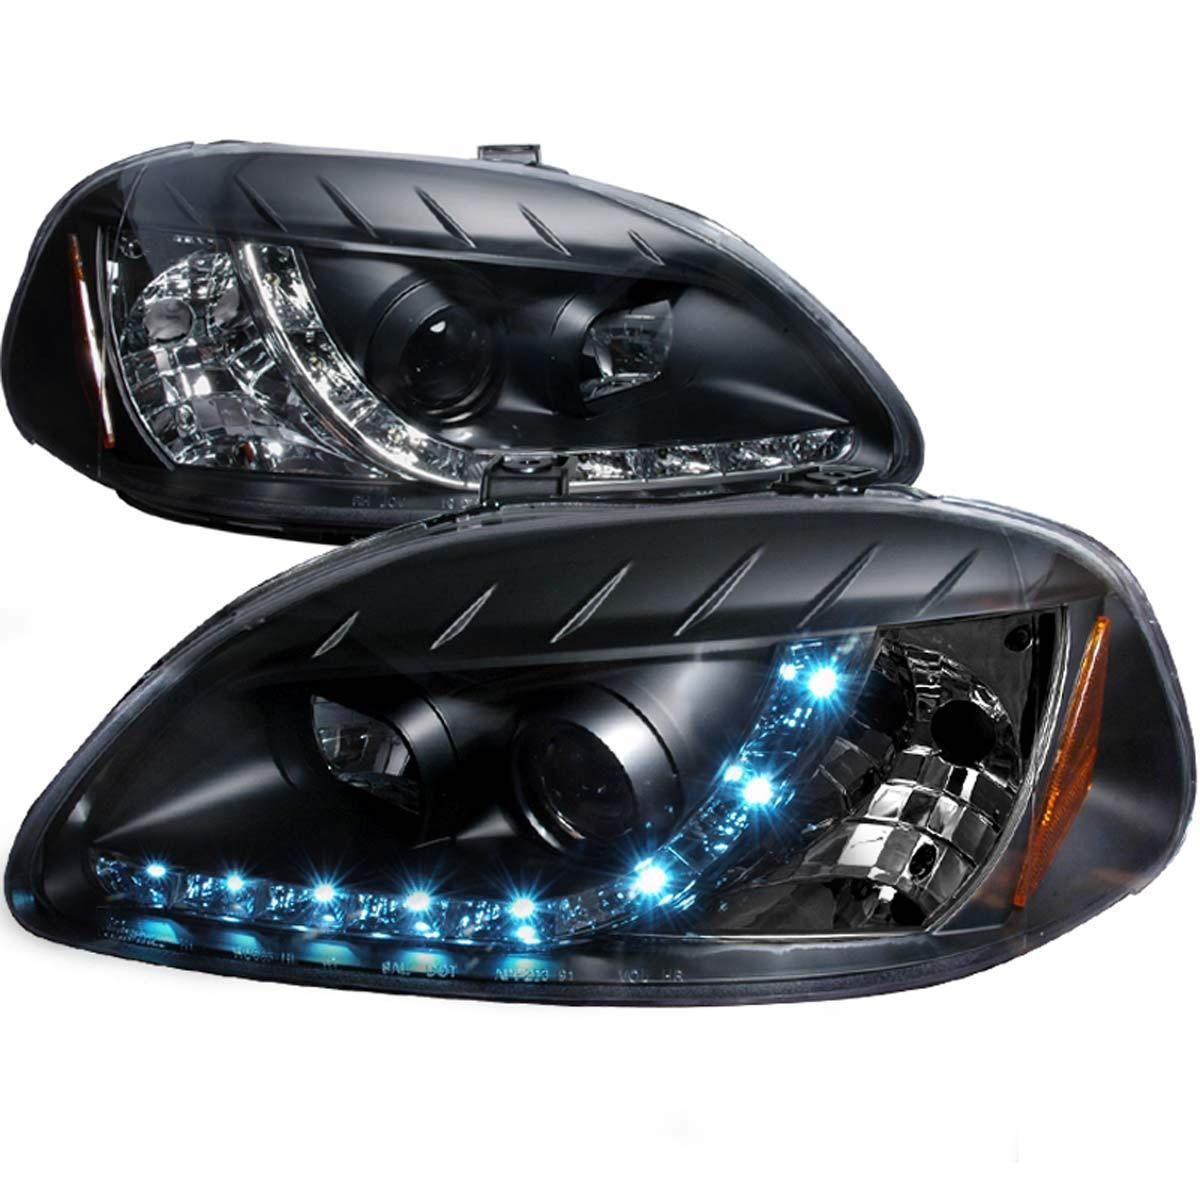 Spec D Projector Headlights Honda Civic Ek Dual Led Halo 96 98 Black Housing Honda Civic Honda Civic Coupe Honda Civic Dx